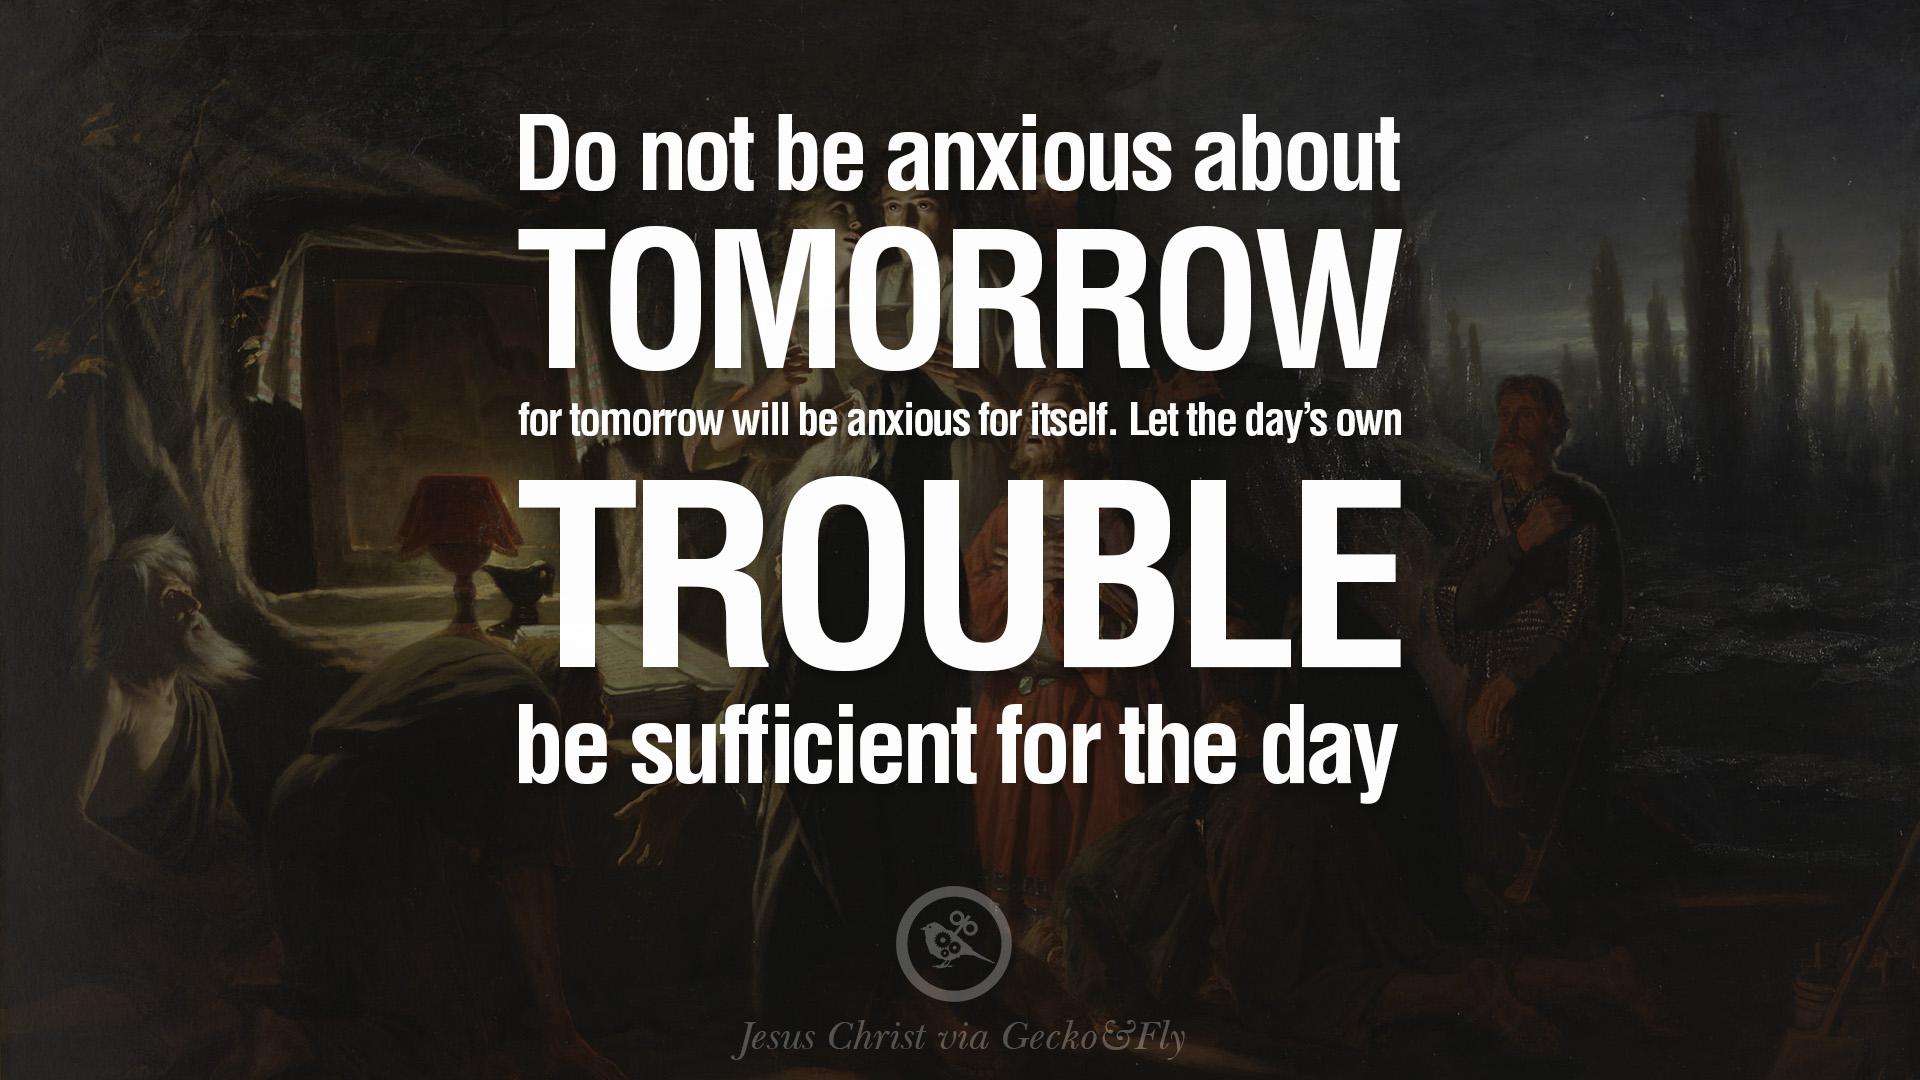 Catholic Biblical Quotes On Life. QuotesGram